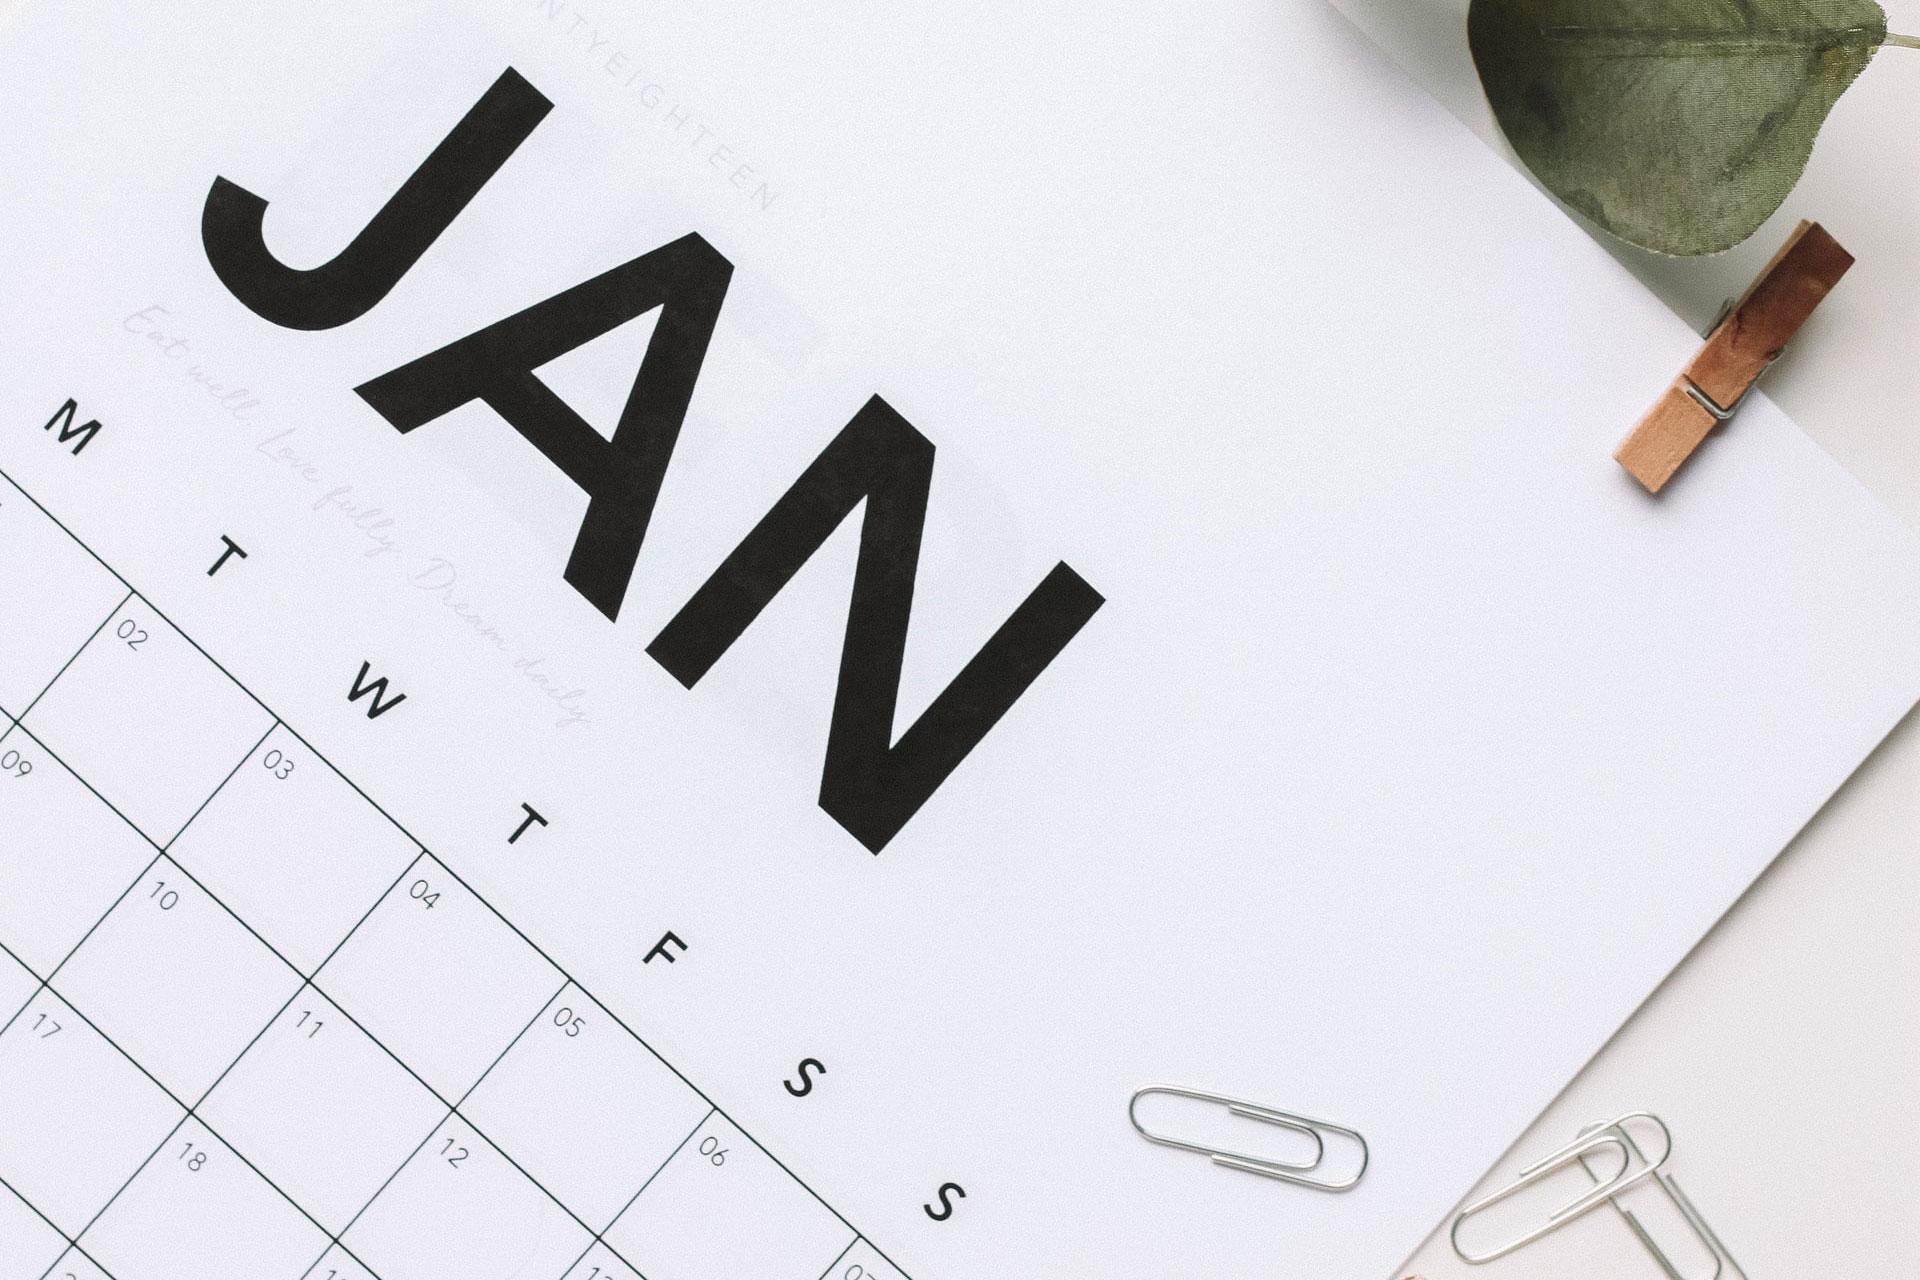 31 January self-assessment deadline approaching